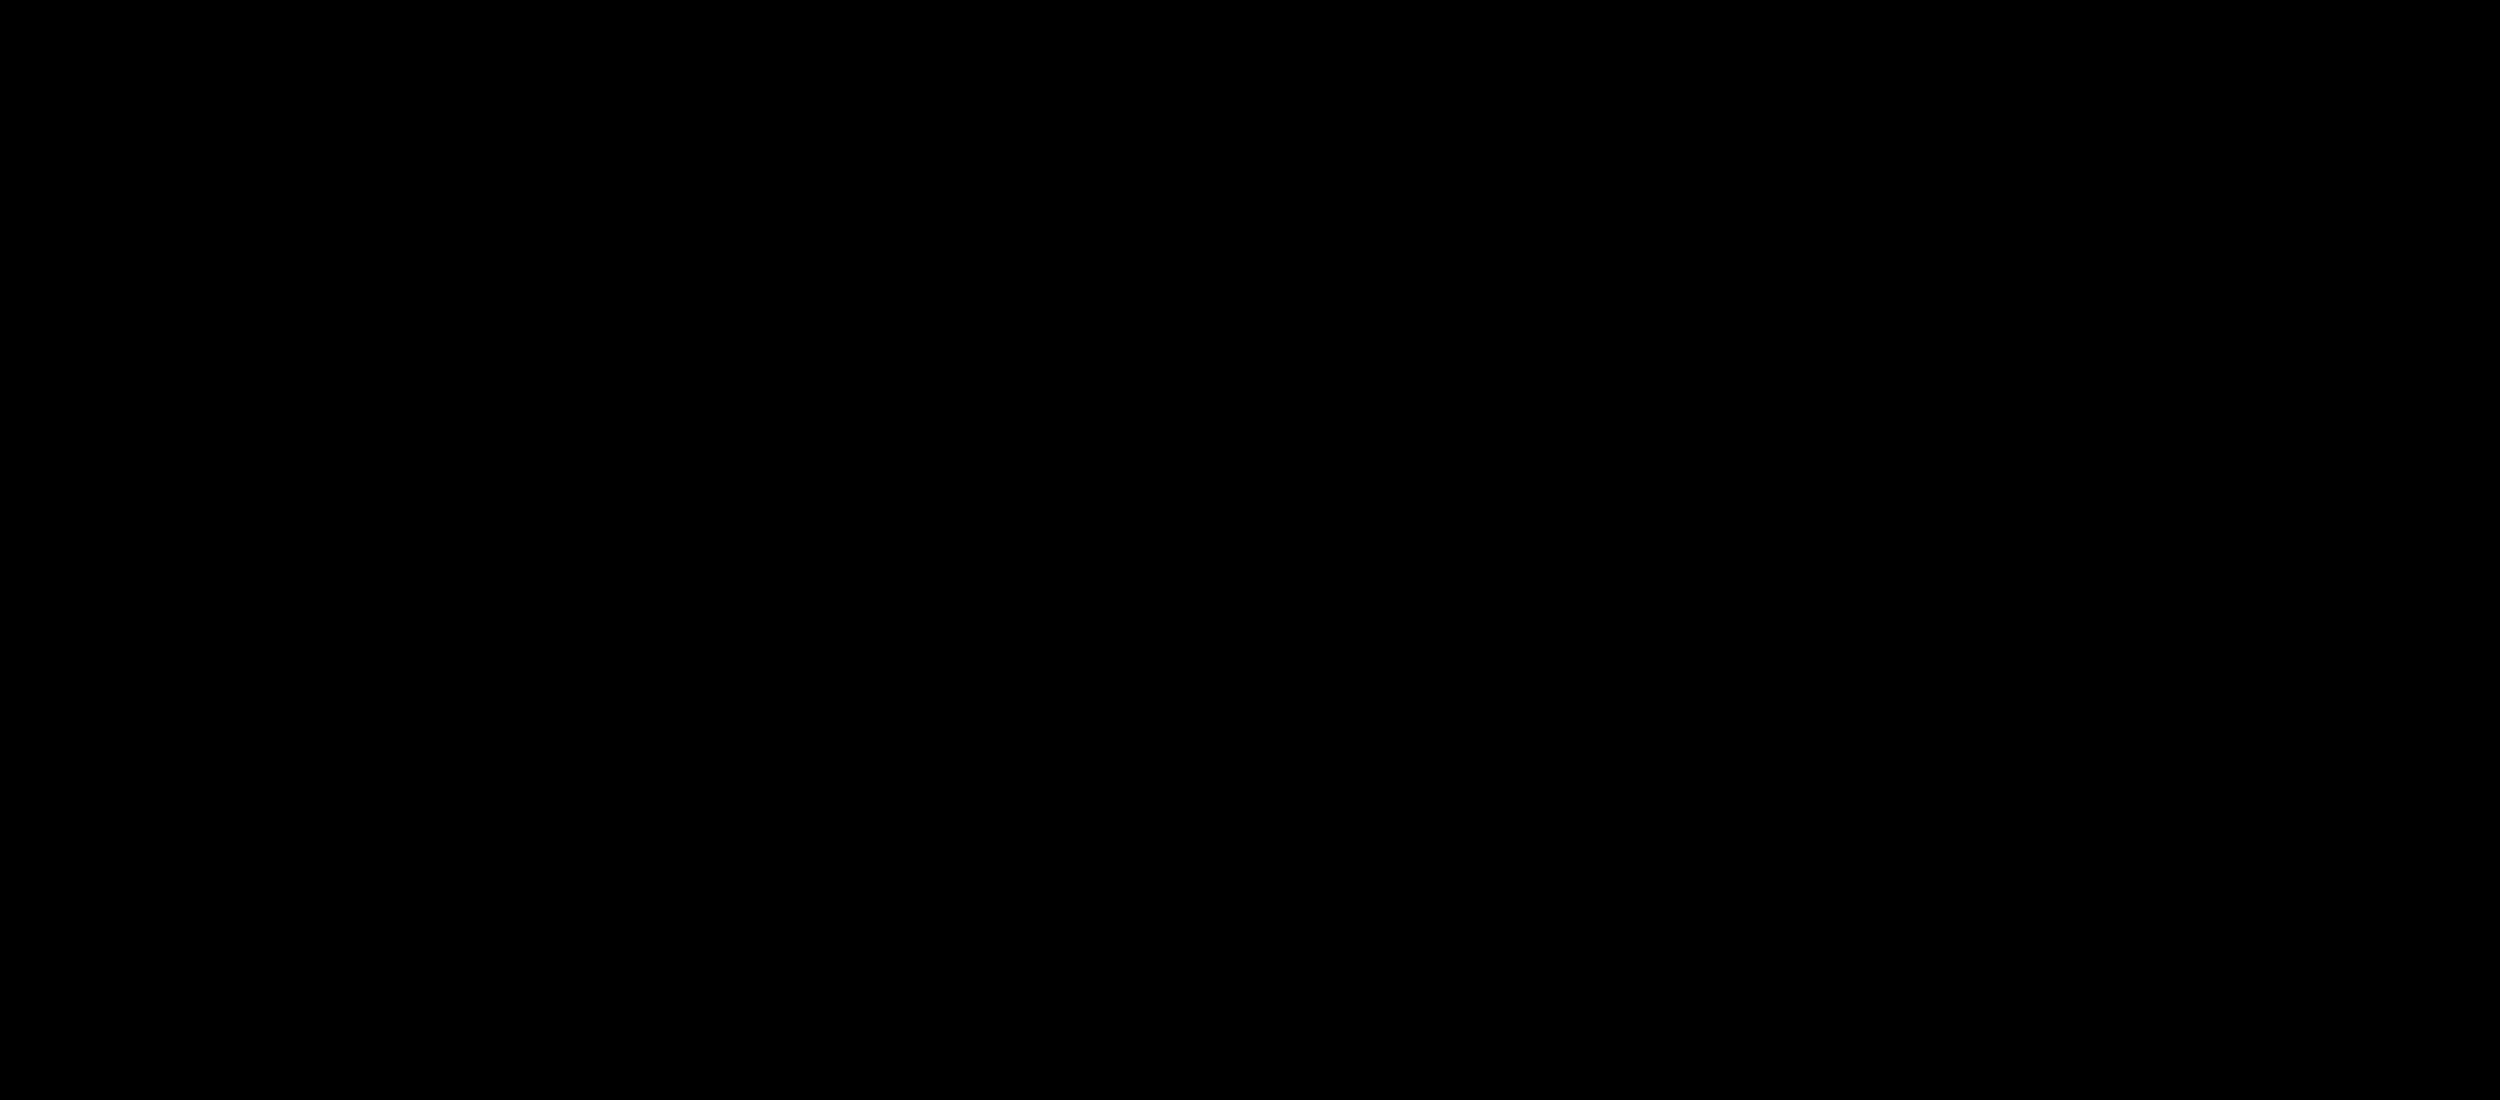 Sofar-black-transparent.png